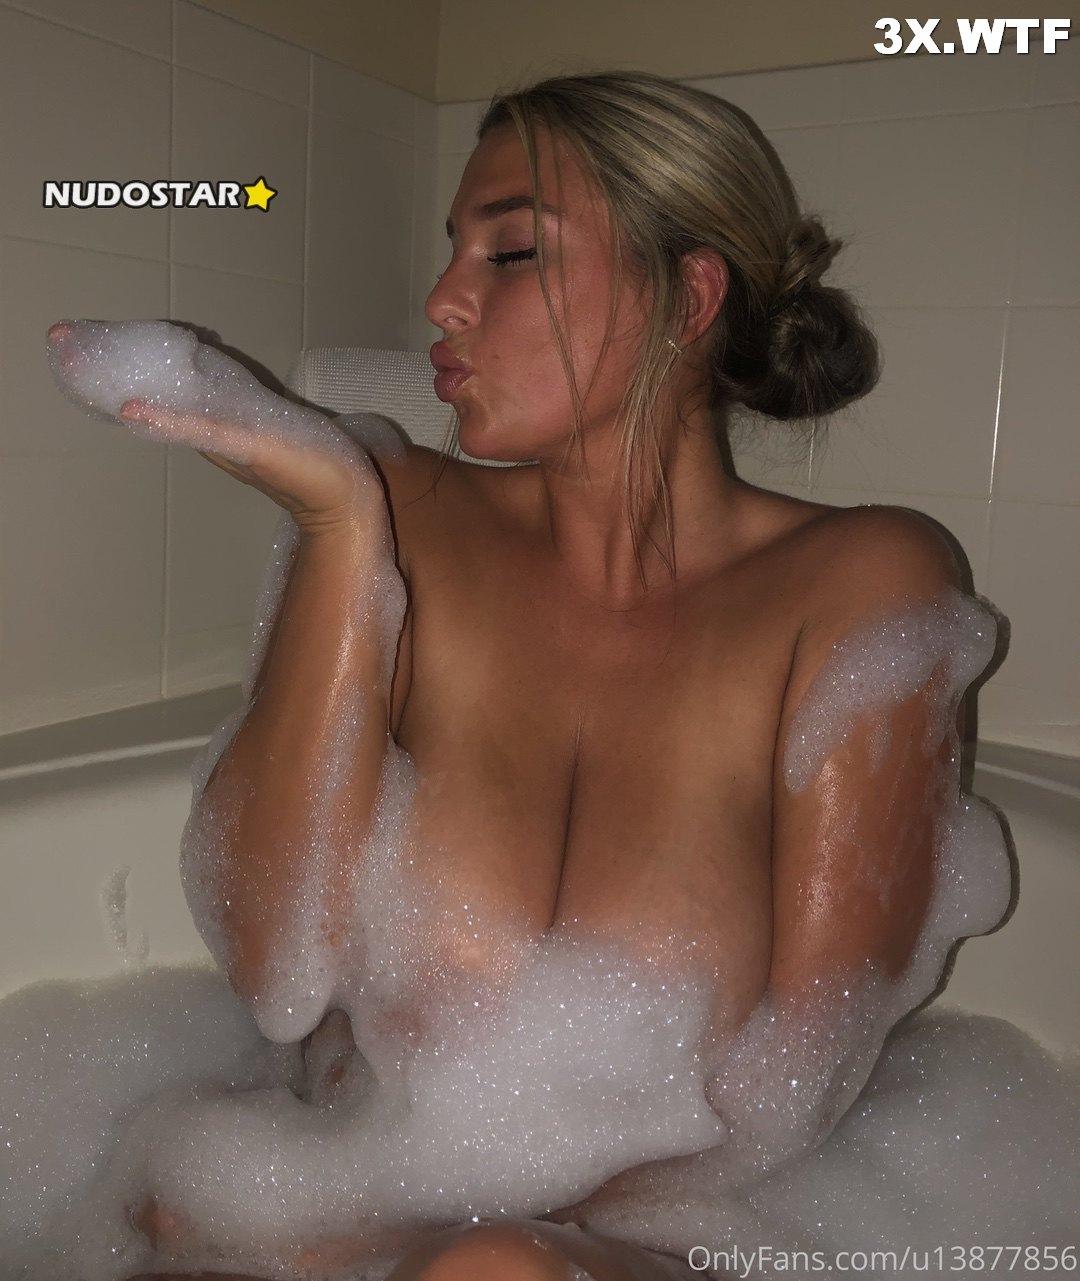 Savannareyy Onlyfans Nudes Leaks 0007